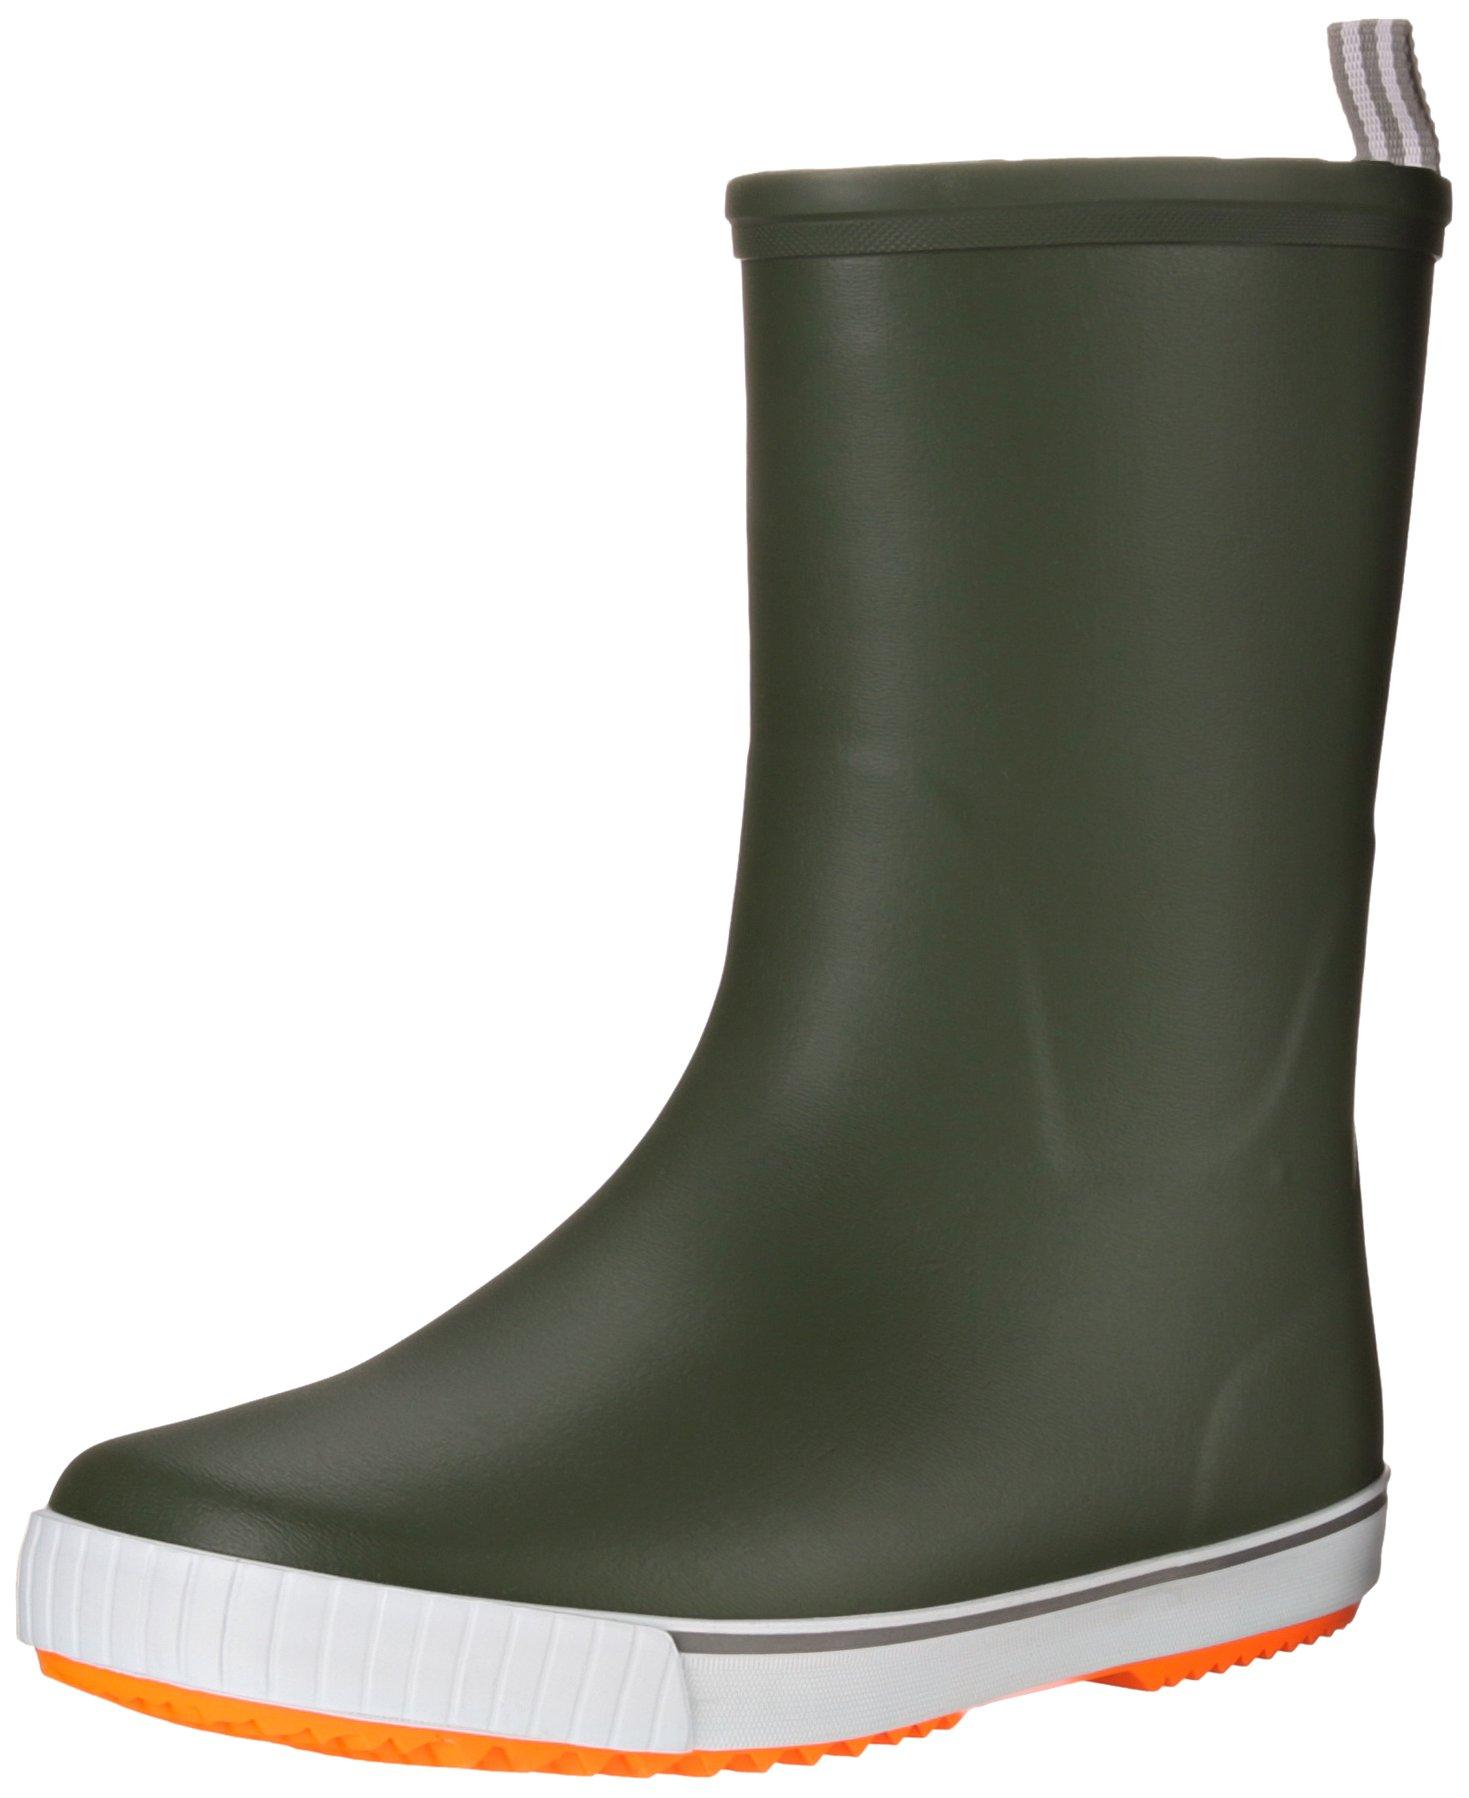 Tretorn Women's Wings Vinter Rain Shoe, Green, 42 EU/11 M US